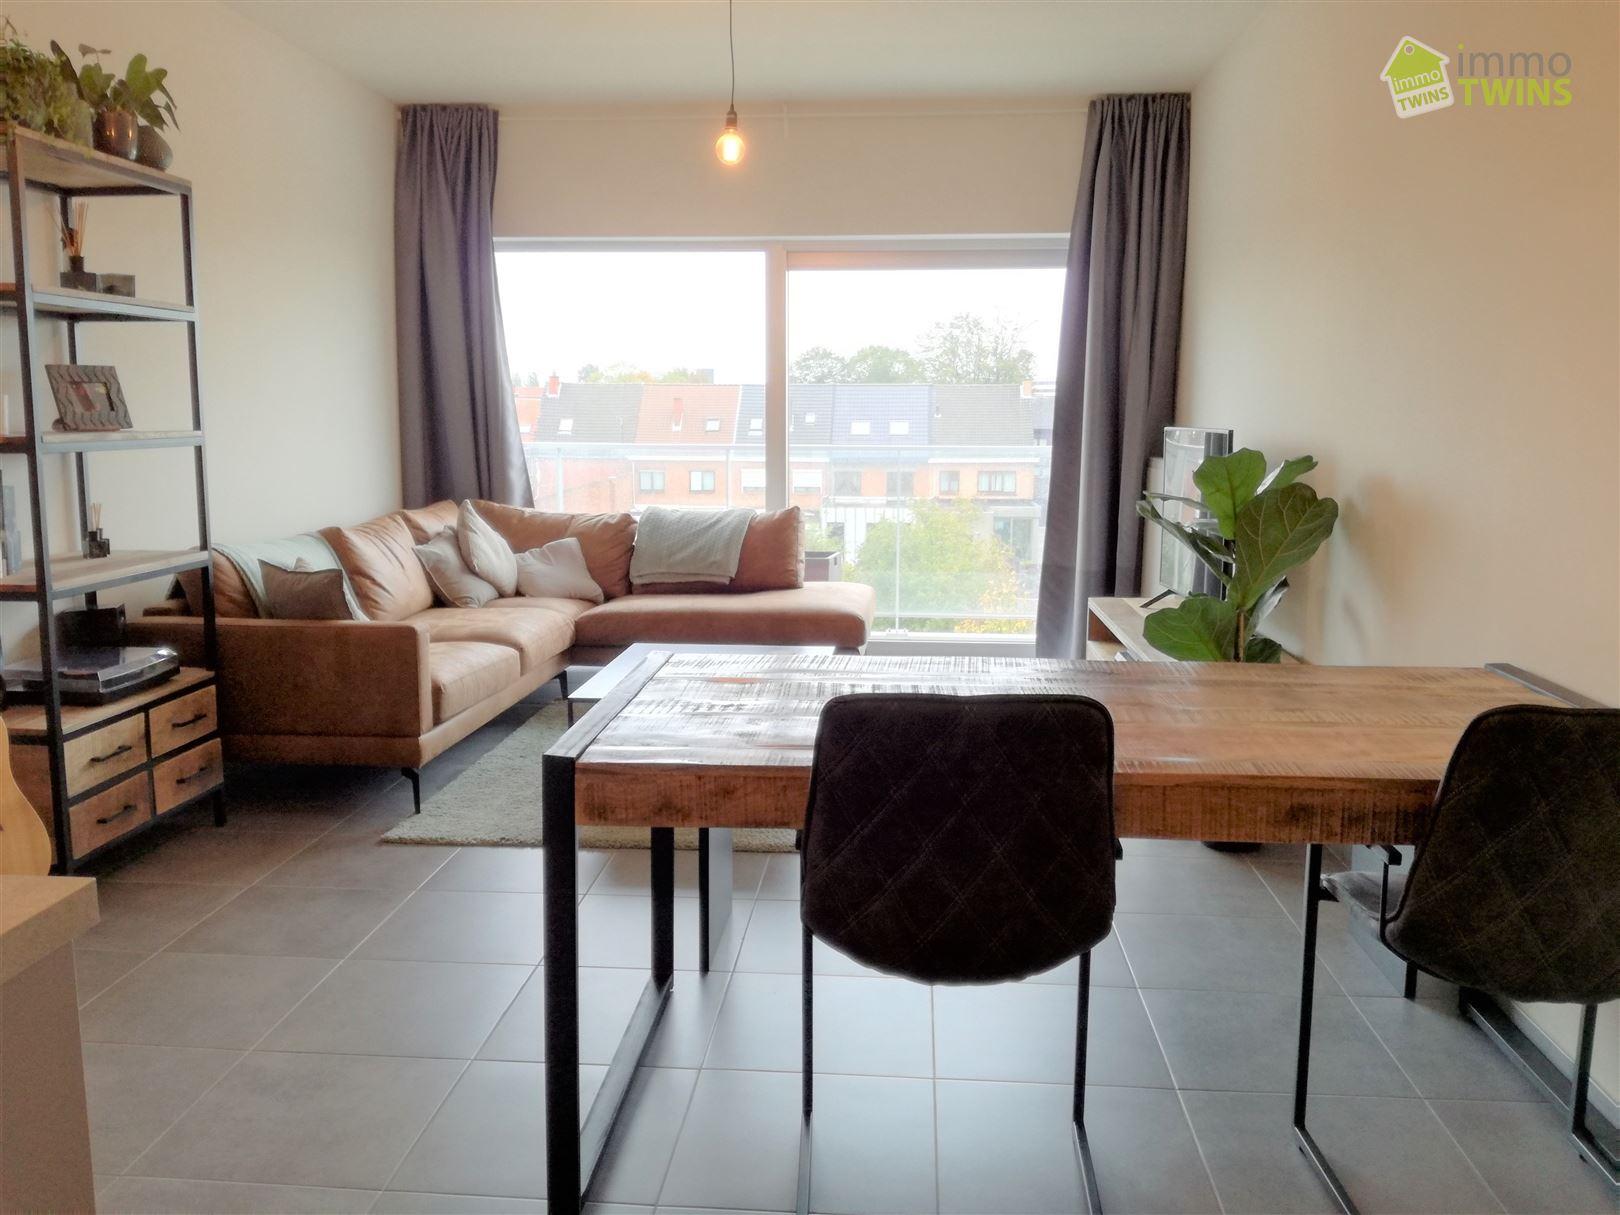 Foto 6 : Appartement te 9160 LOKEREN (België) - Prijs € 750